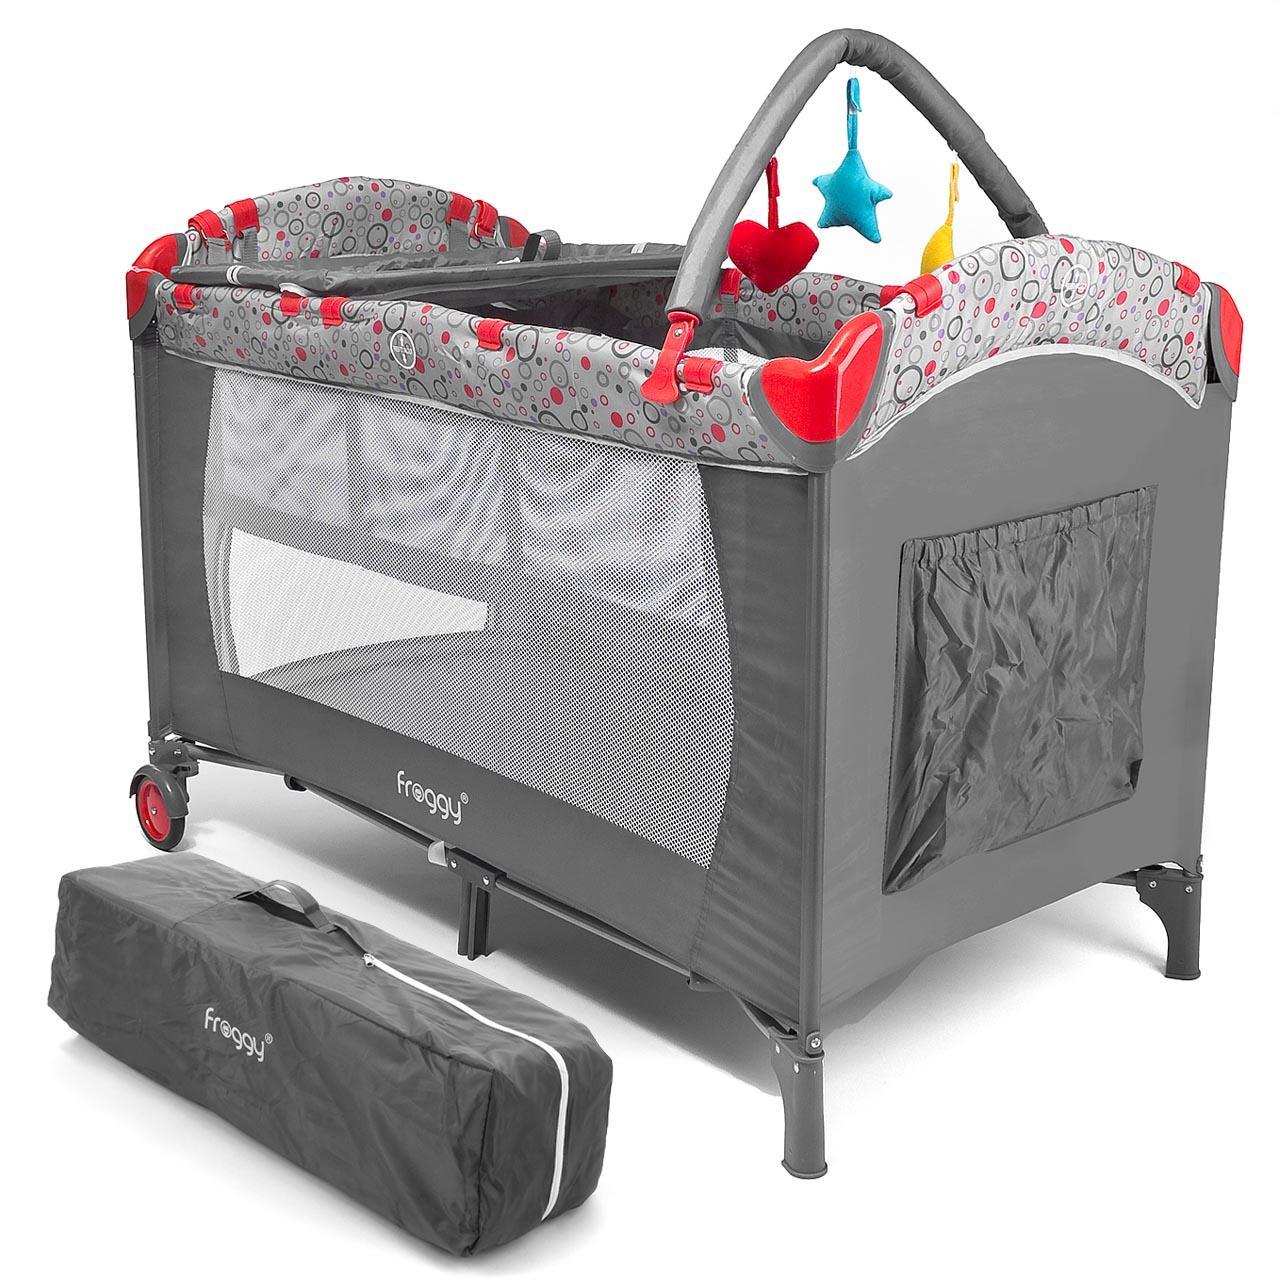 kinderbett klappbett babybett laufstall reisebett babyreisebett kinderreisebett ebay. Black Bedroom Furniture Sets. Home Design Ideas